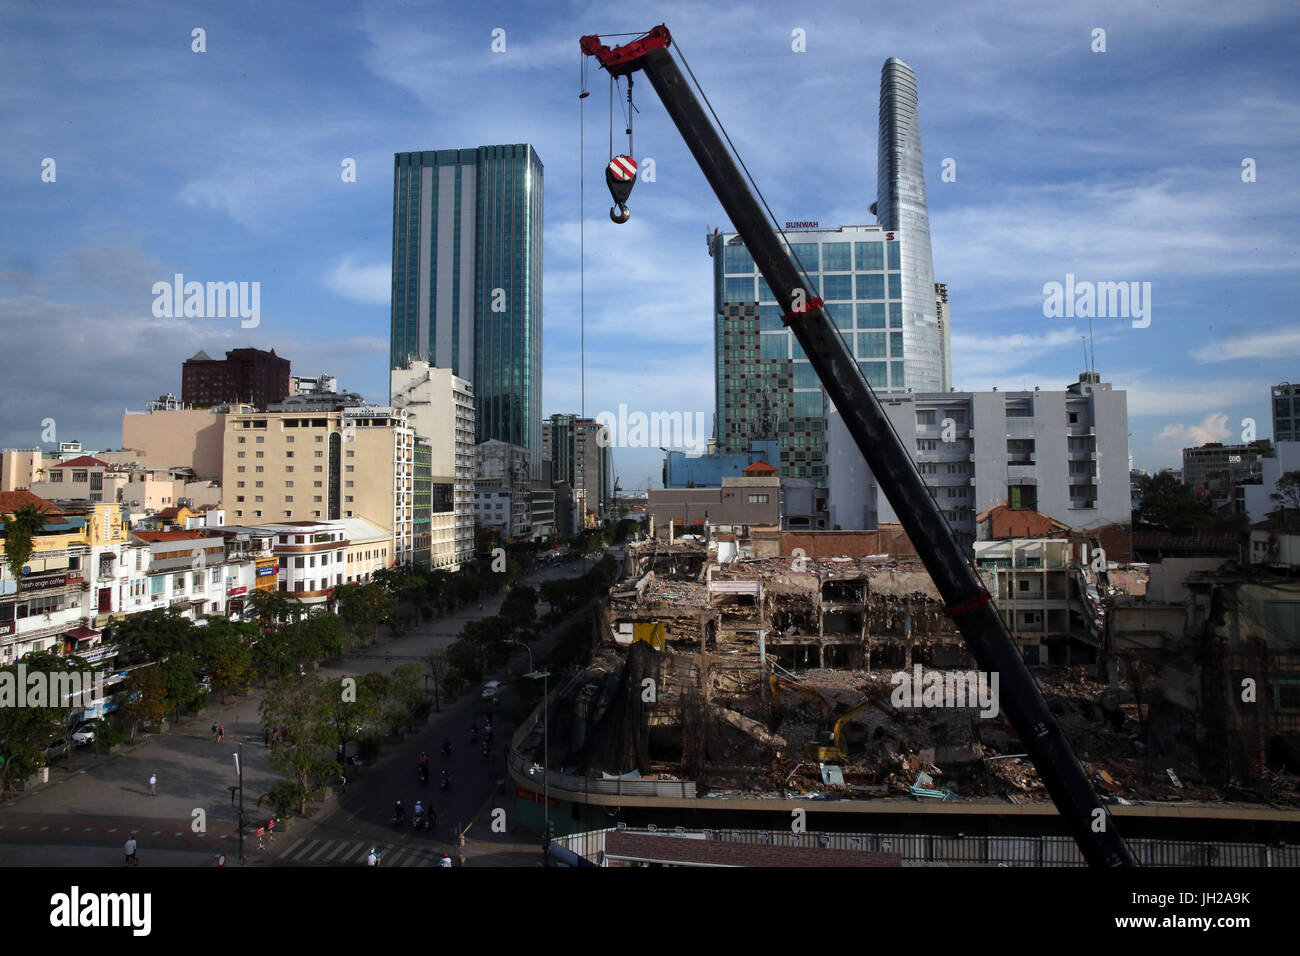 Construction site in Ho Chi minh city. Crane.  Vietnam. Stock Photo